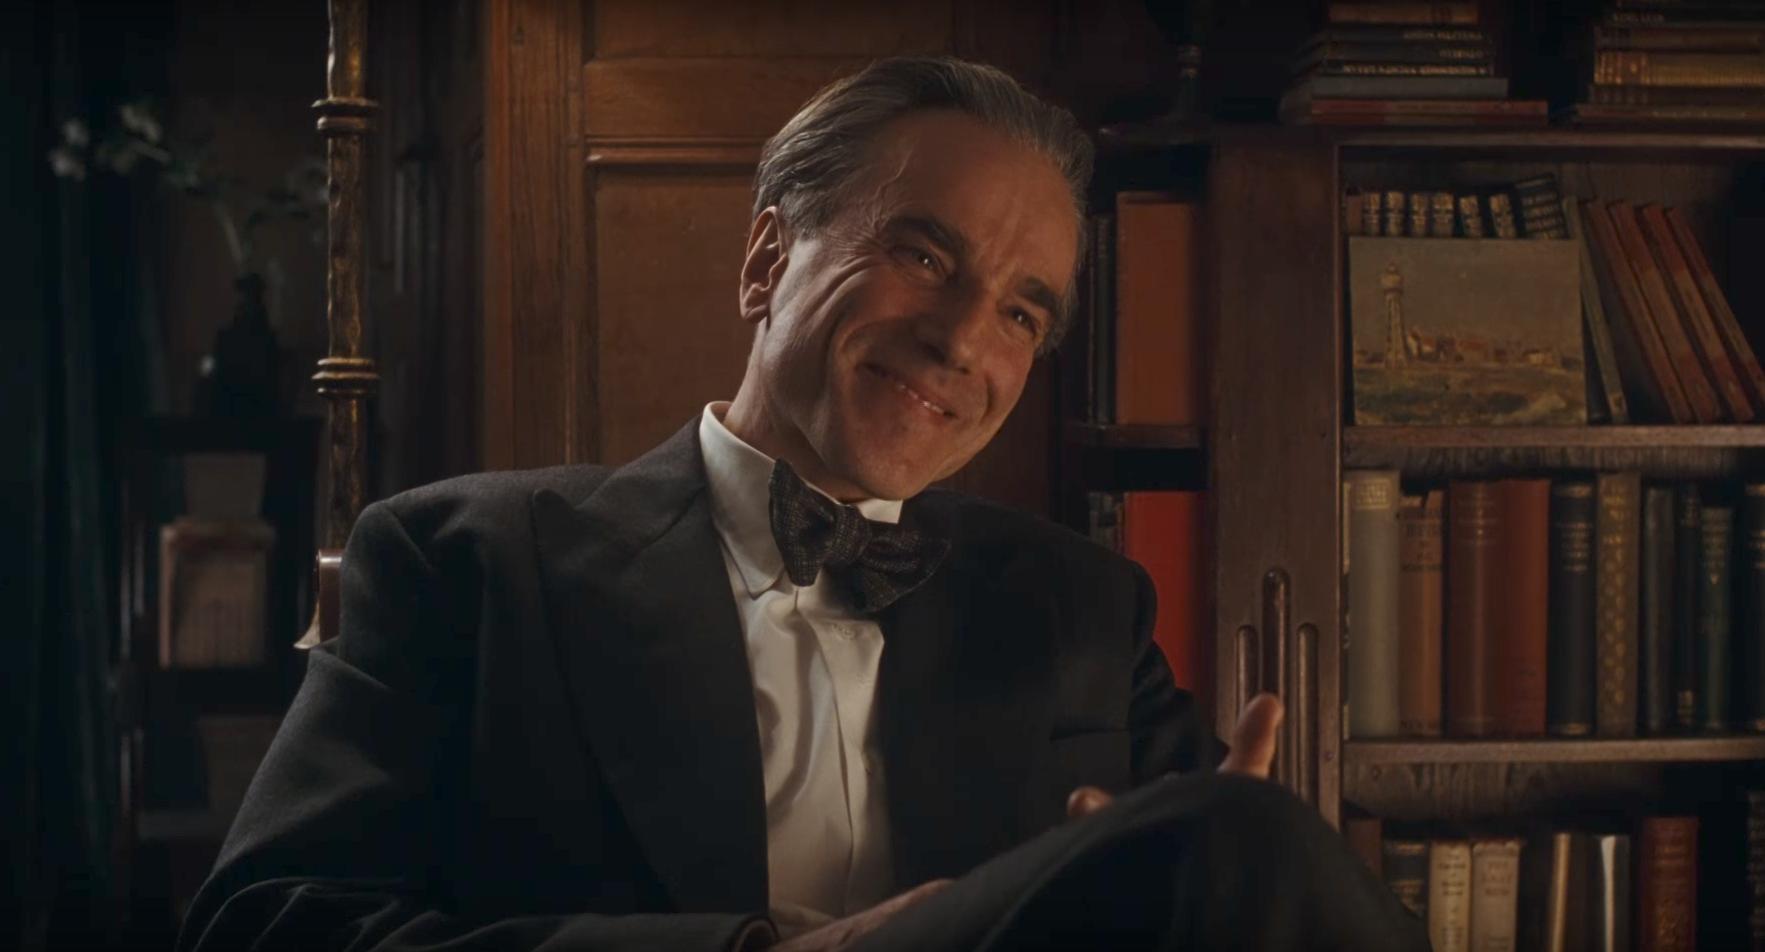 Phantom Thread trailer: Watch Daniel Day-Lewis in his final